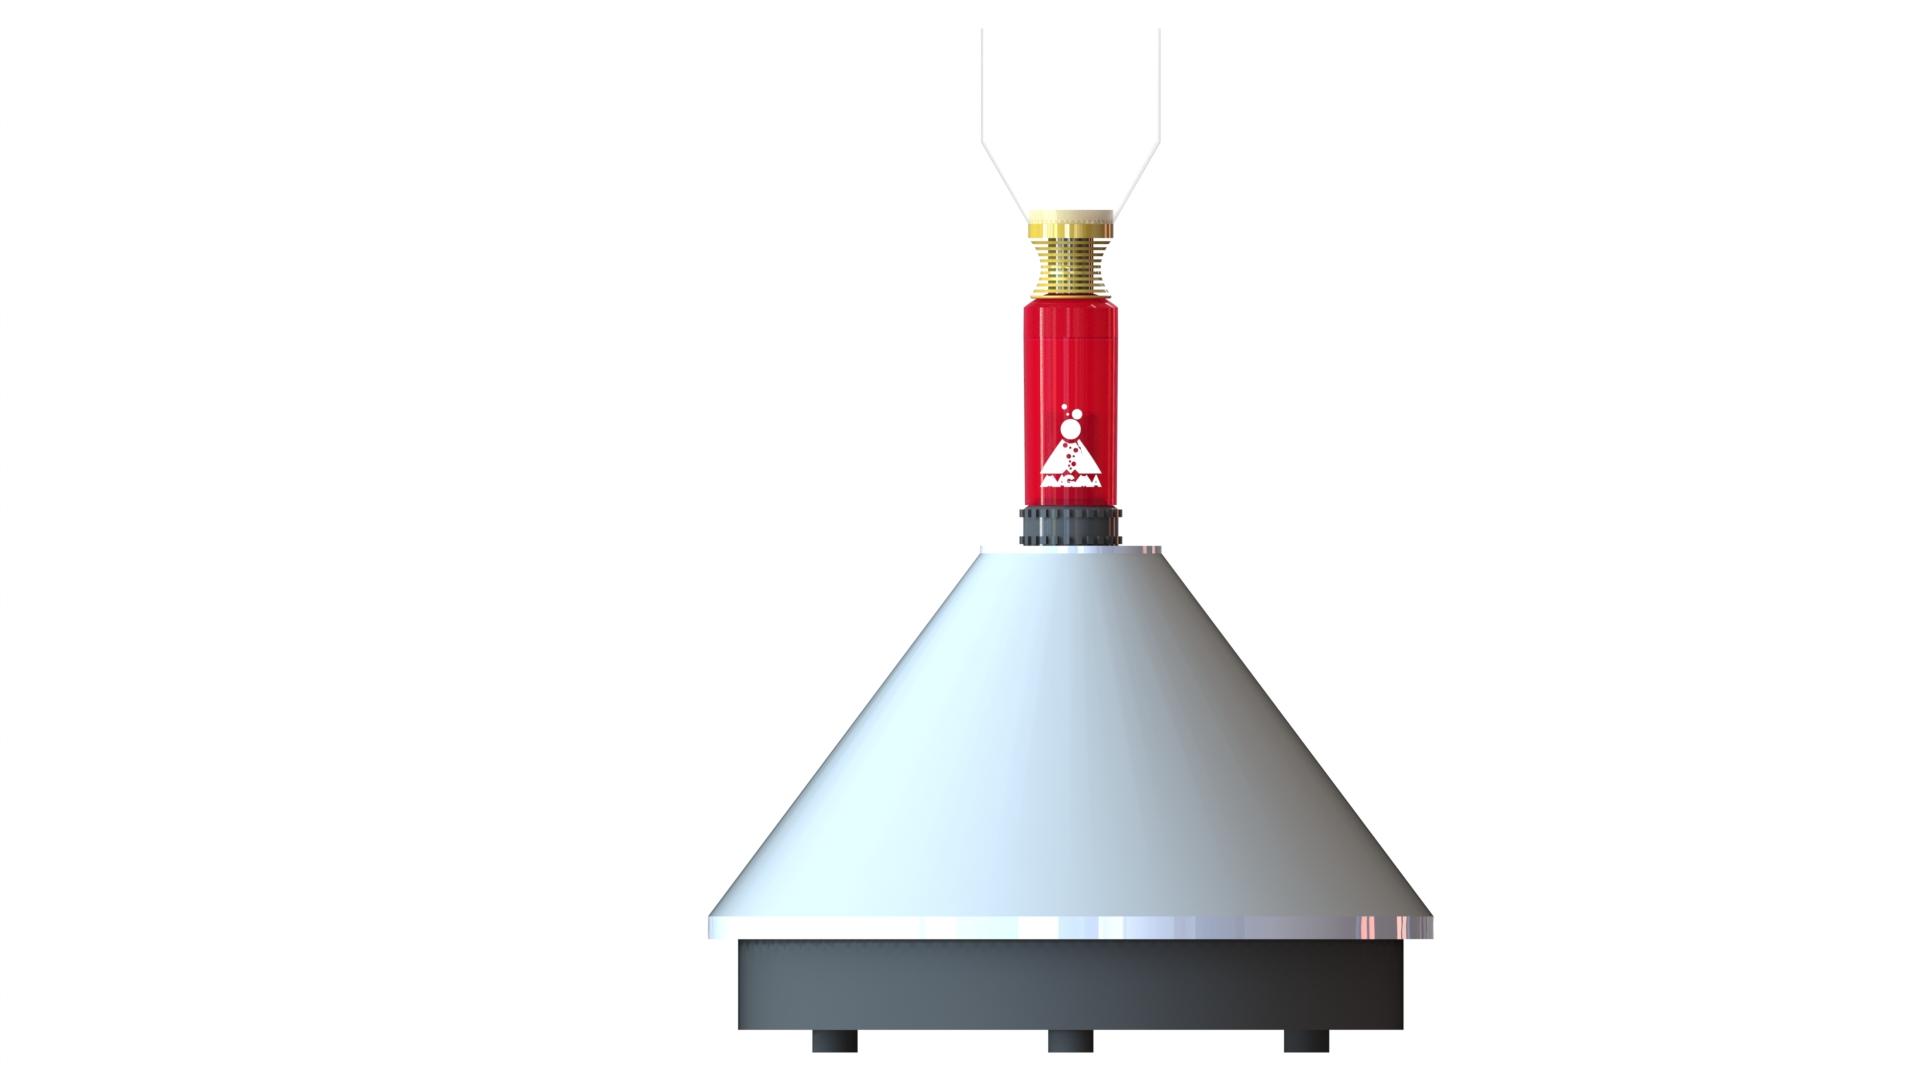 Volcano Assembly 4 JPEG.JPG